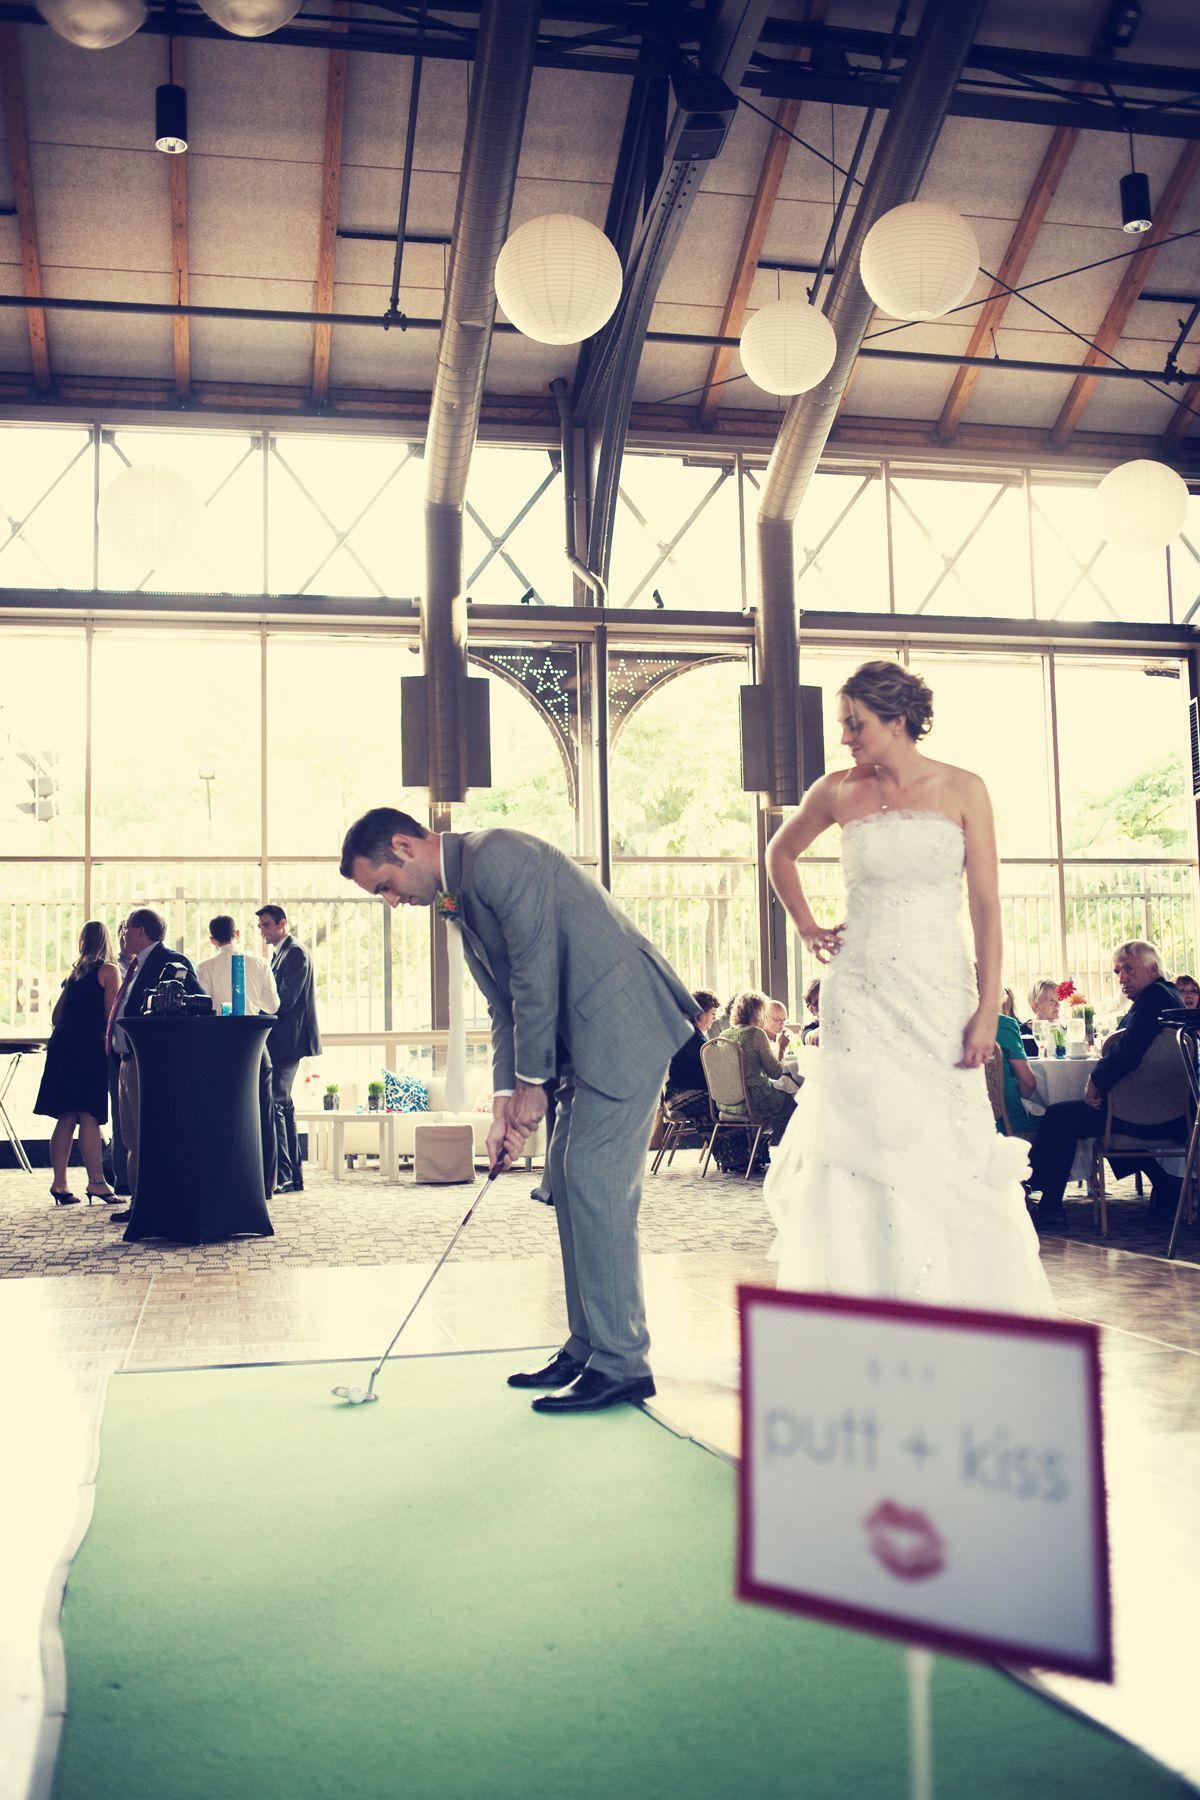 Mini Golf At The Couples Wedding Reception What A Fun Idea Photo